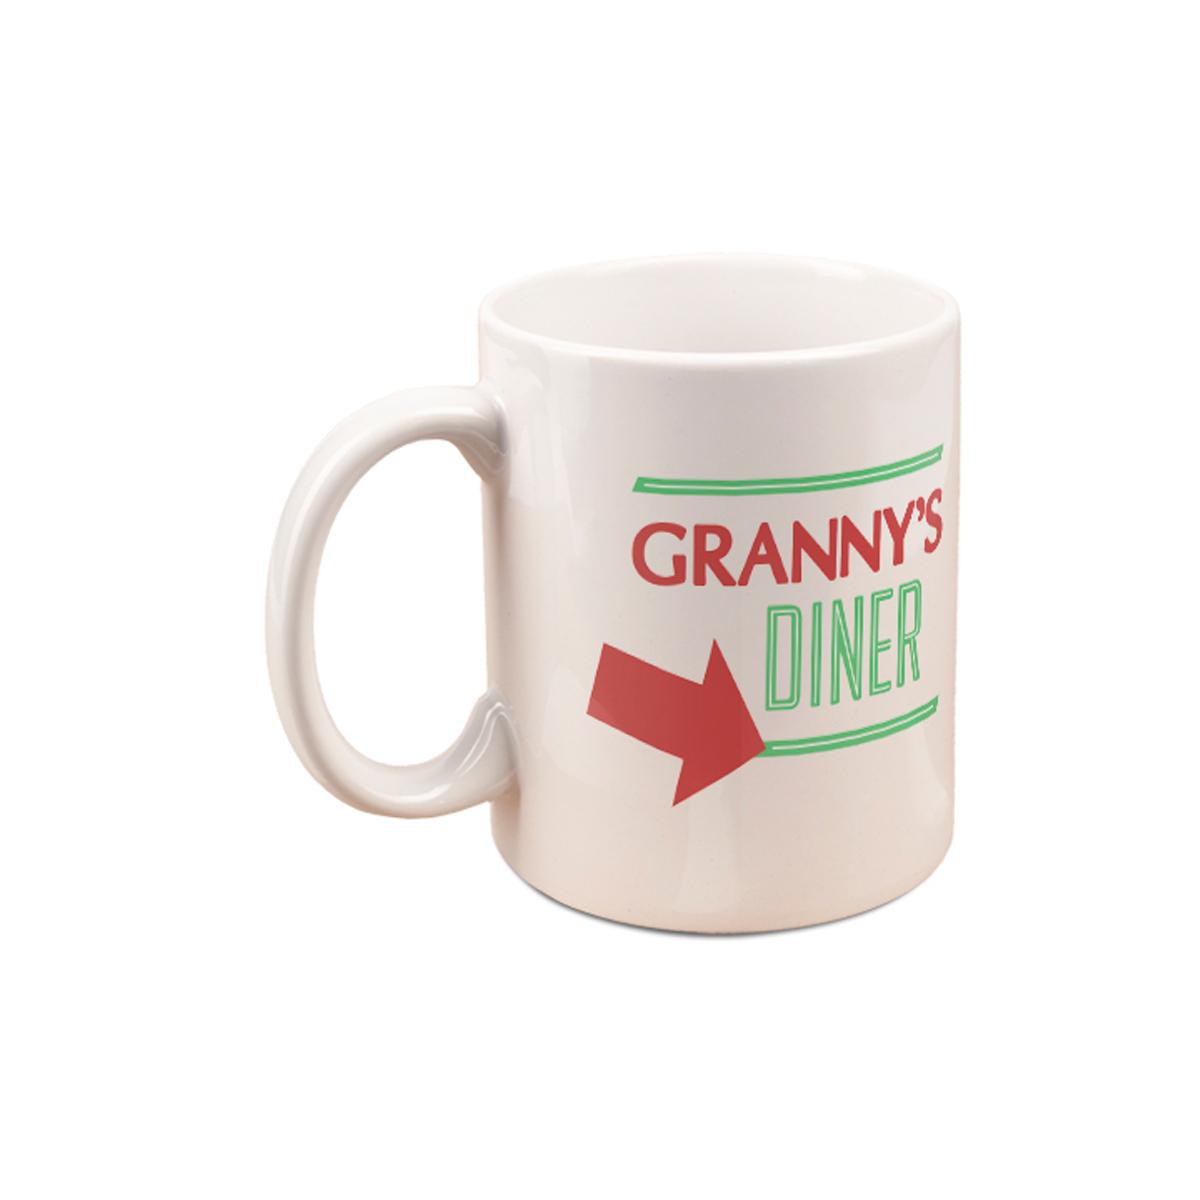 Once Upon A Time Granny's Diner Mug